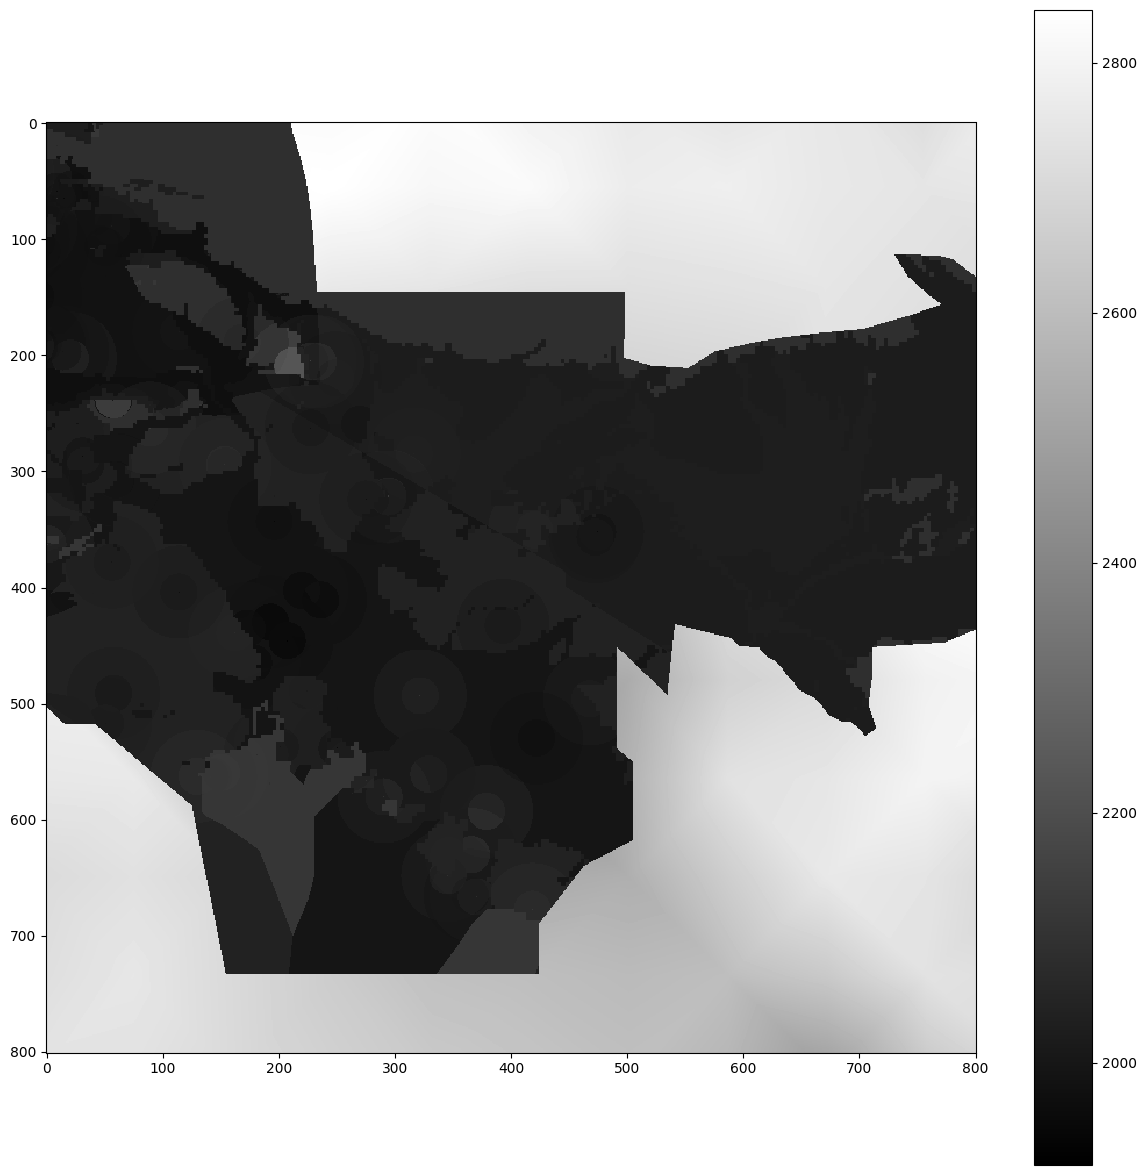 bench/seismic/wp/la_habra/meshes/velocity_model/plots/rho_10.png